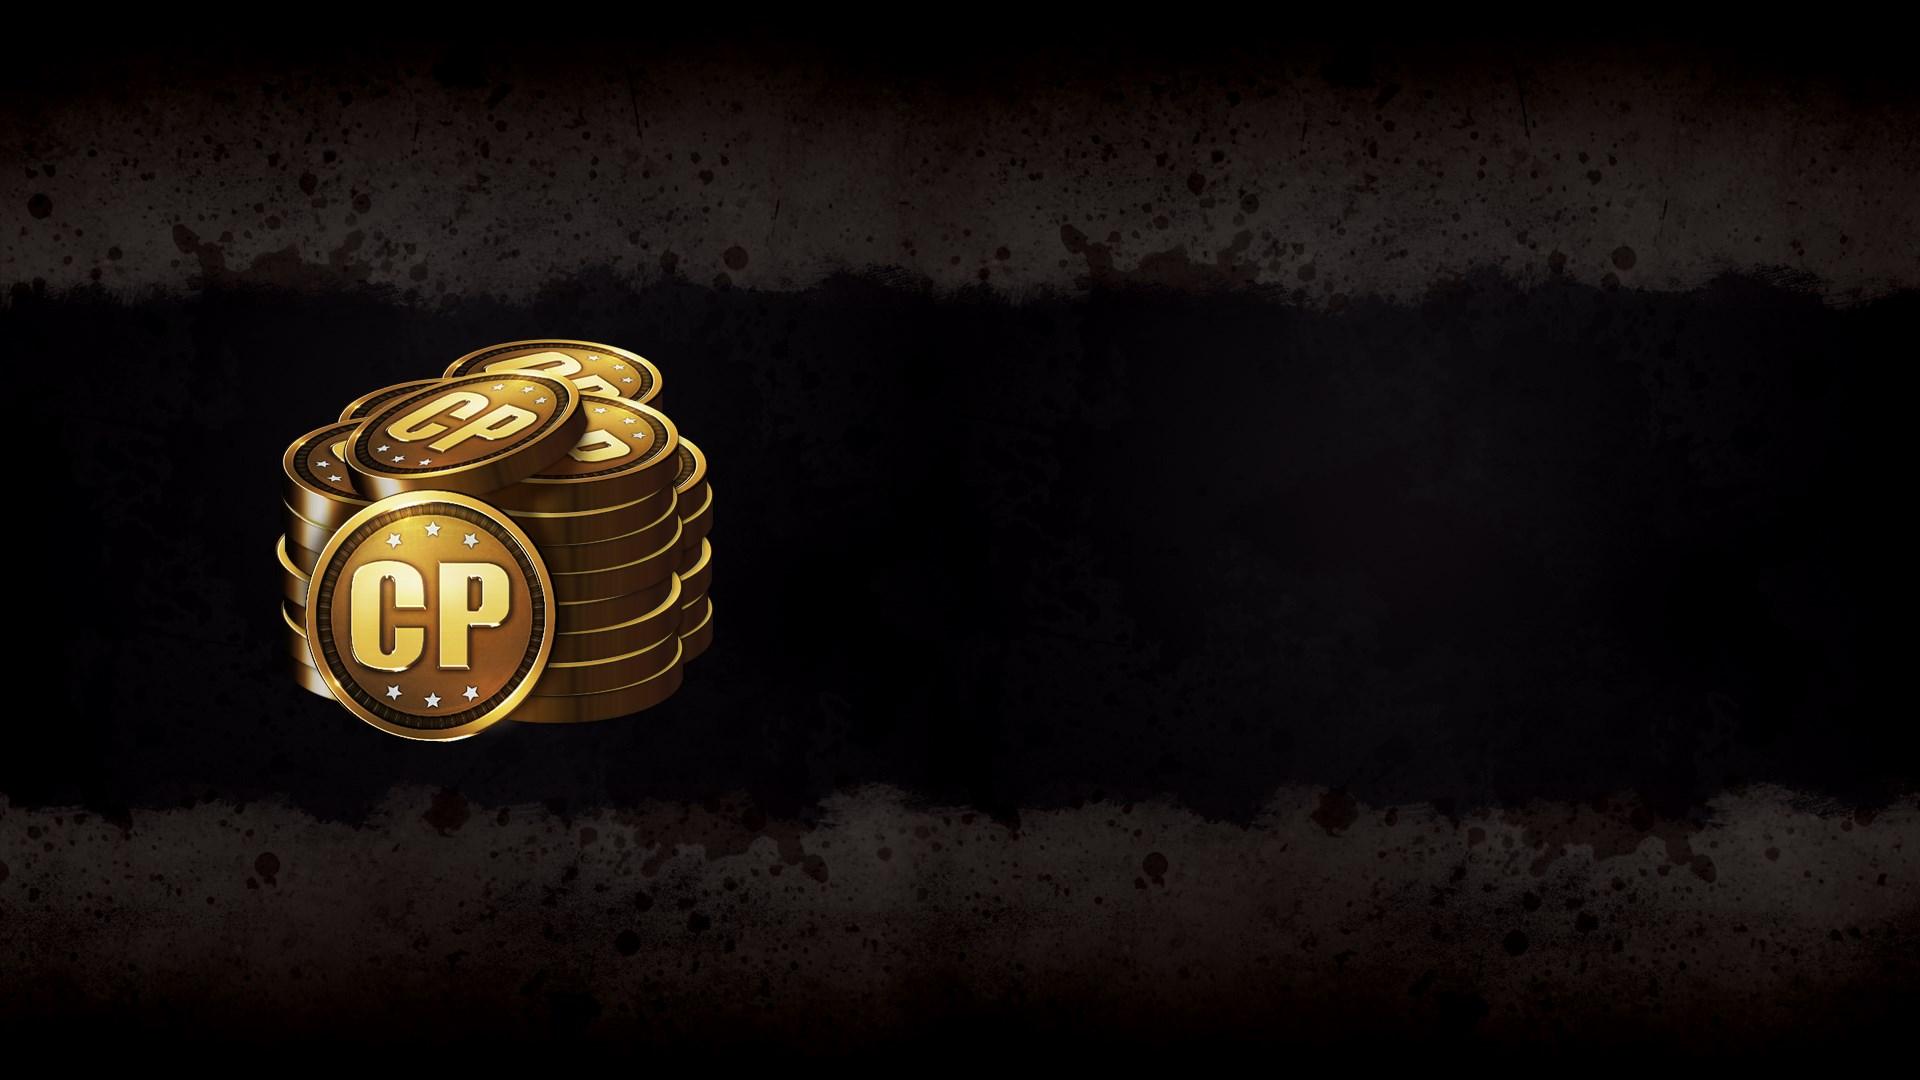 5,000 Call of Duty®: Infinite Warfare Points